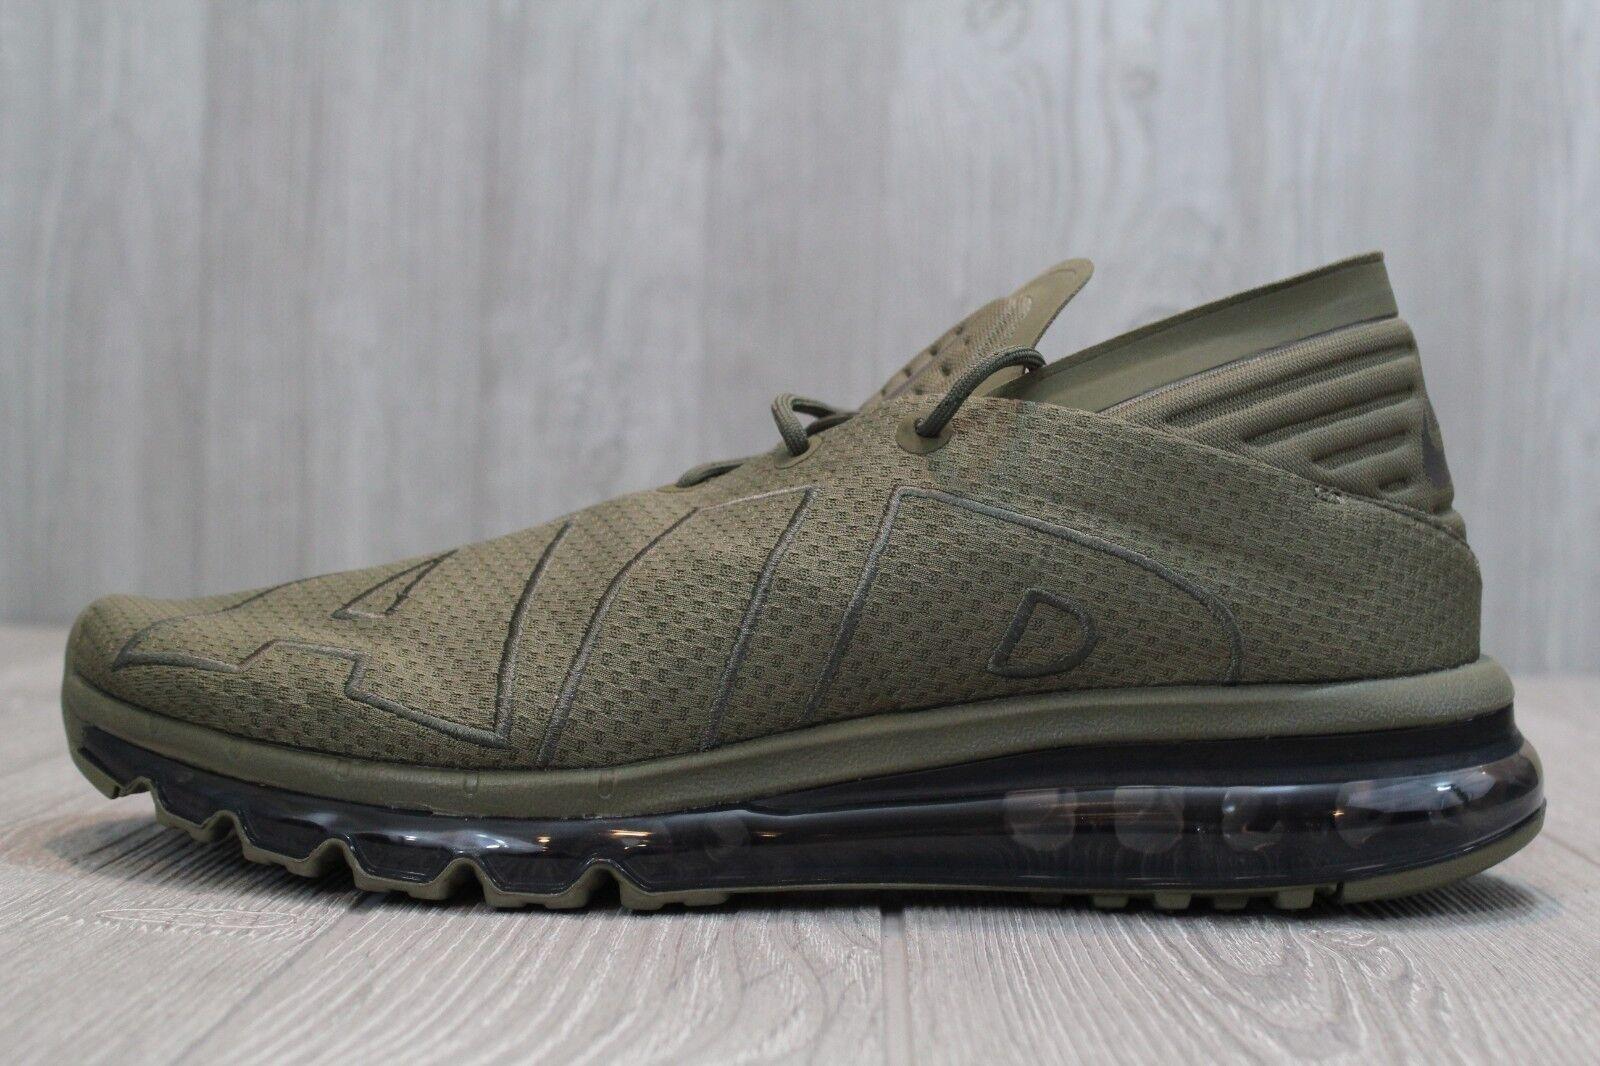 25 Men's Nike Air Max Flair Running shoes Medium Olive Sequoia 942236 200 11.5